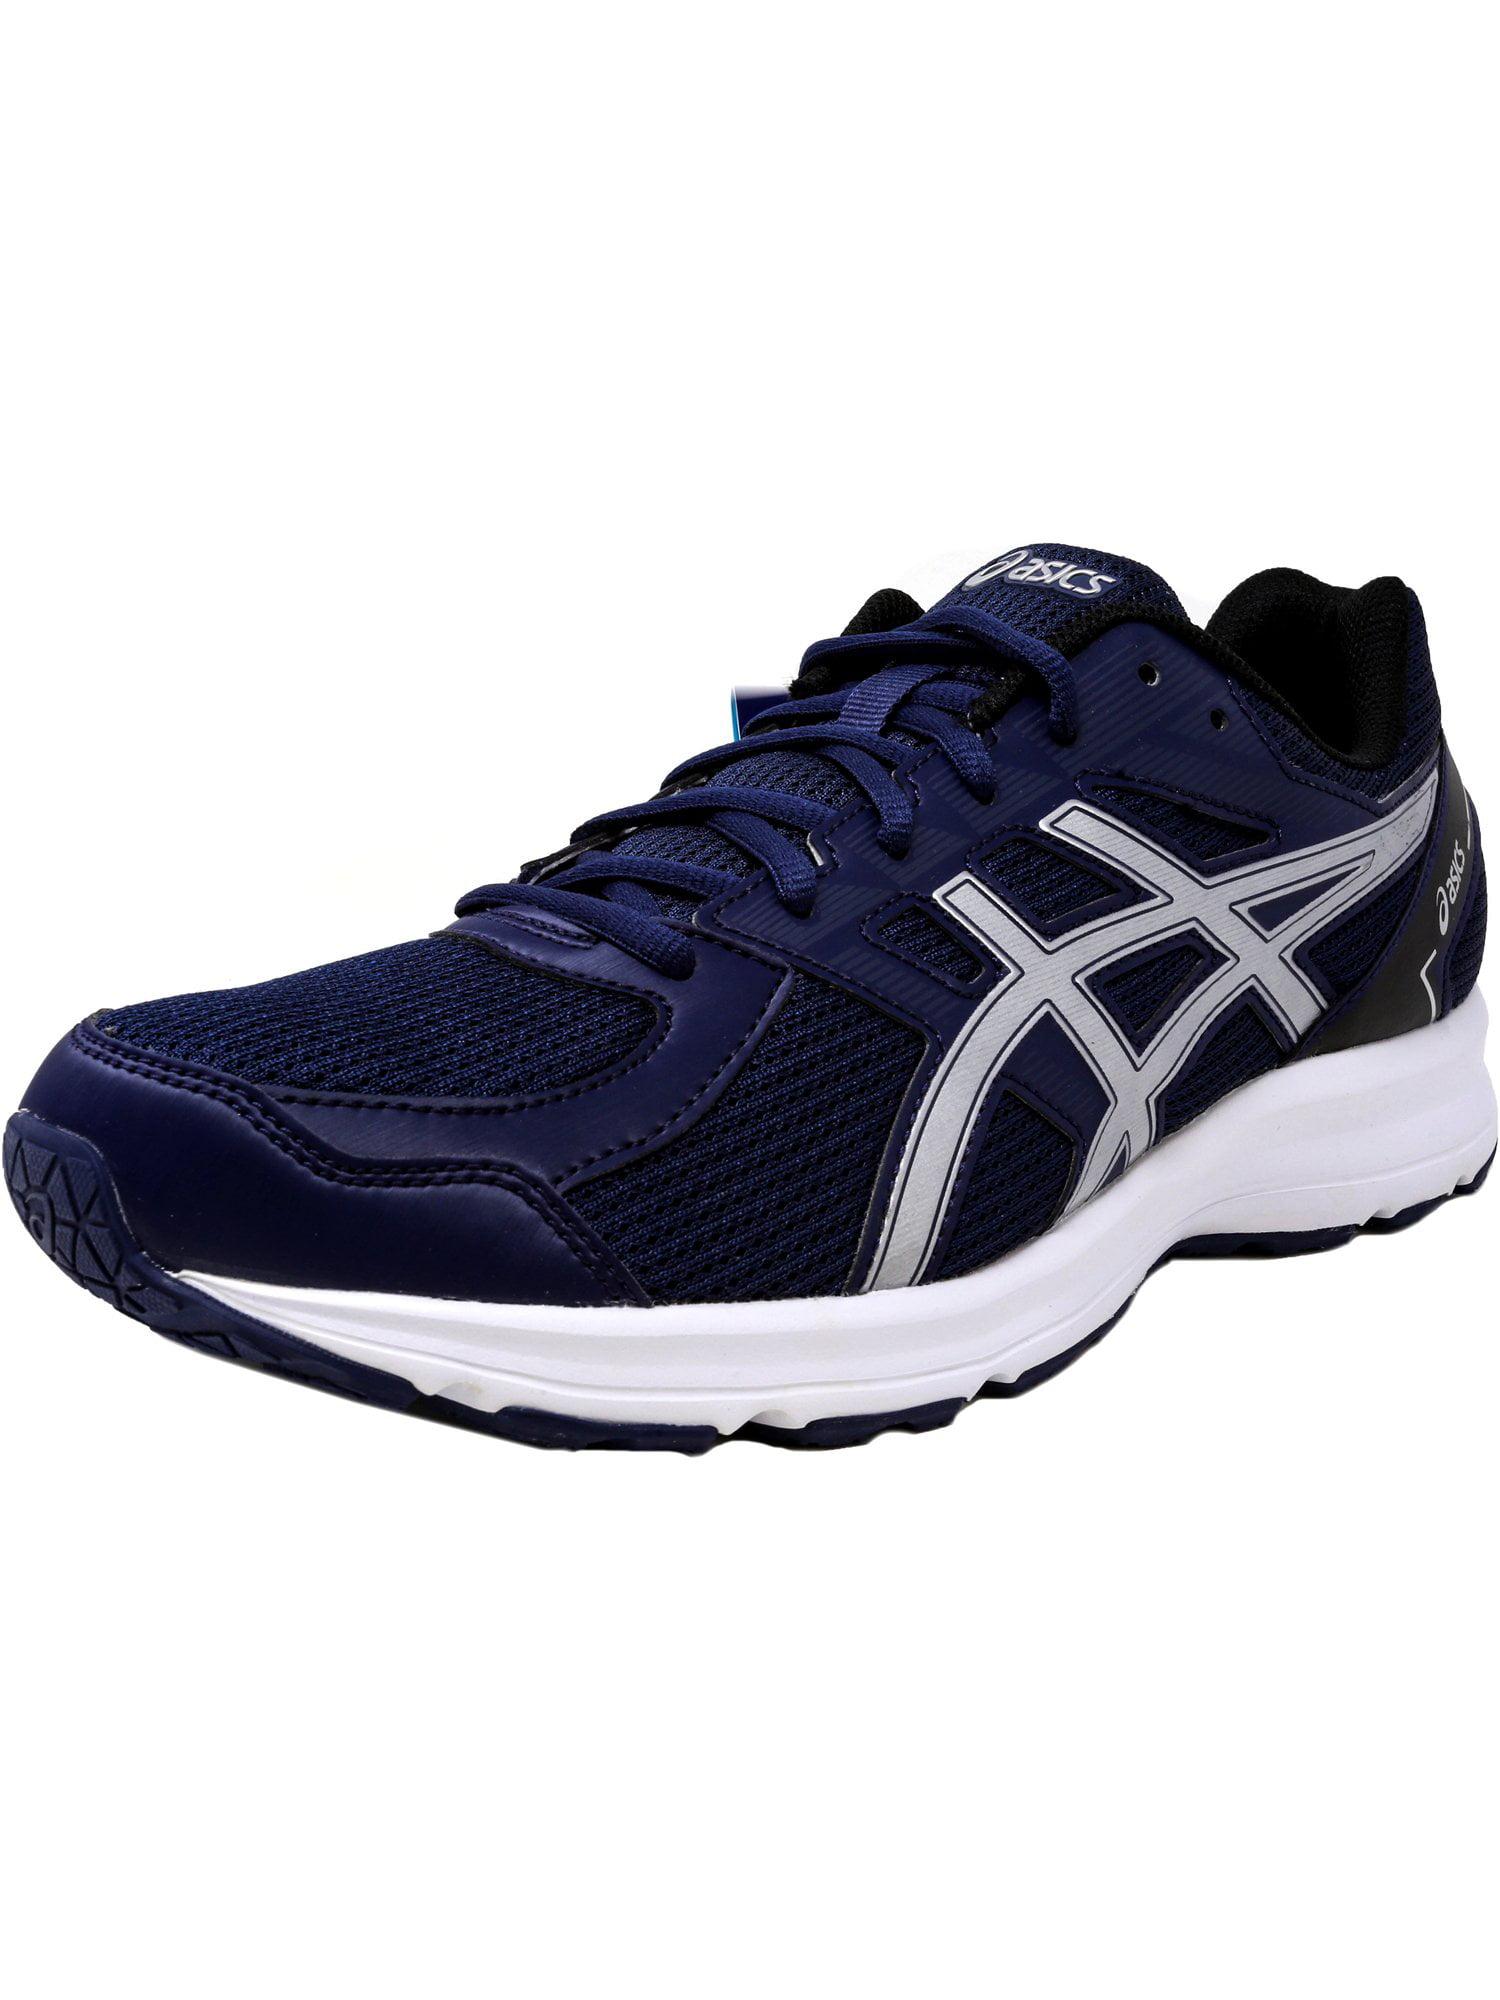 Asics Men's Jolt Indigo Blue / Silver Black Ankle-High Running Shoe - 10WW